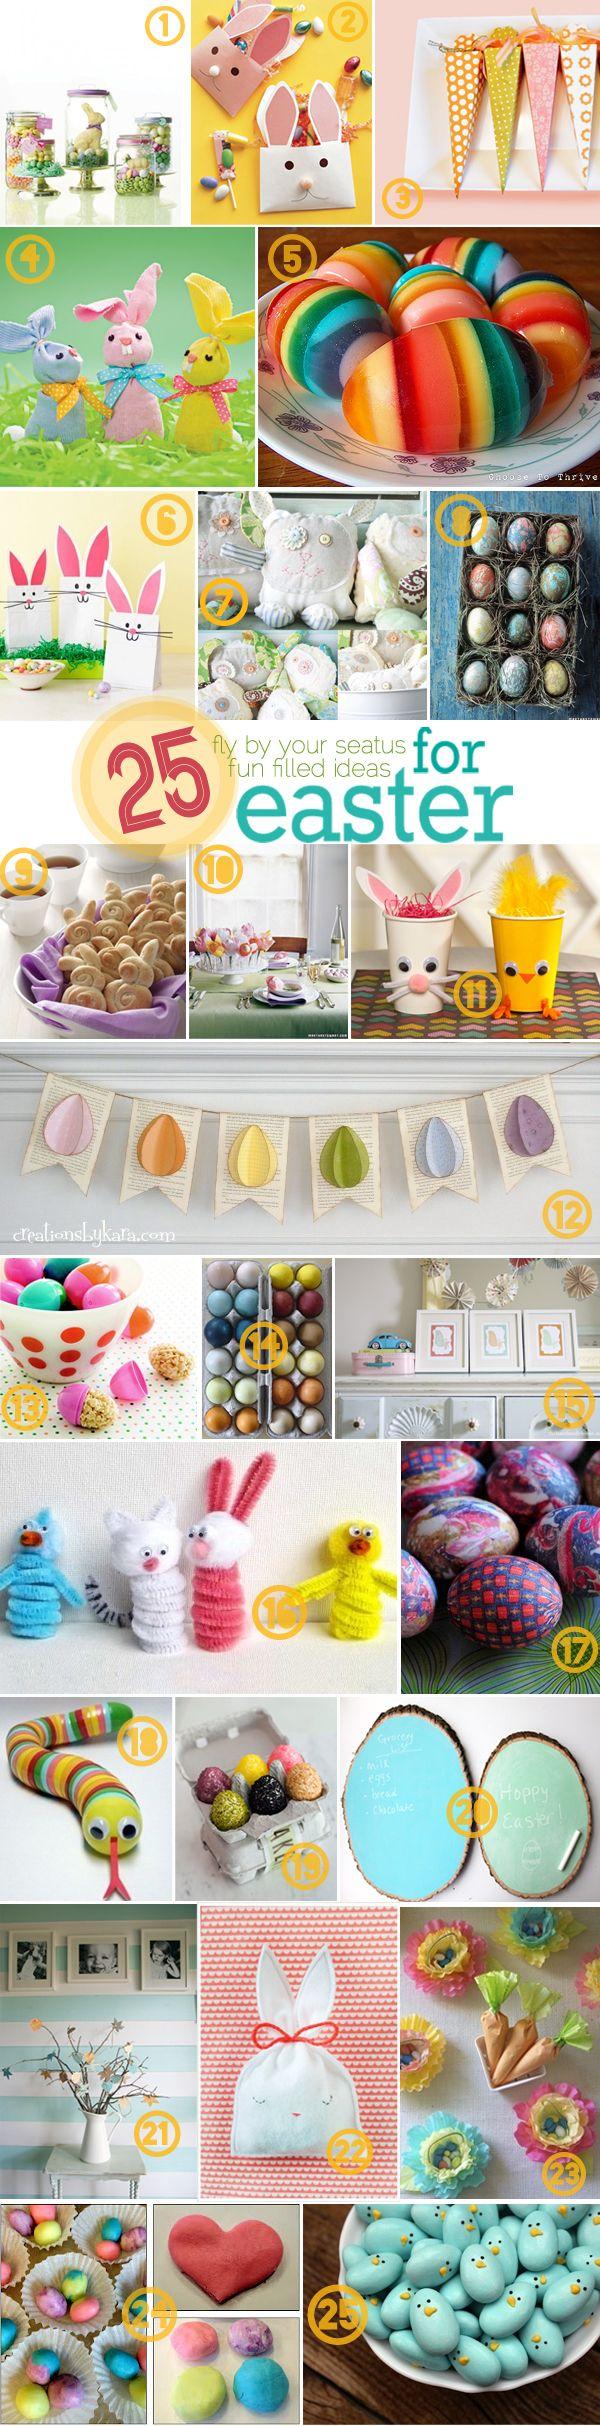 Watch 25 Pretty Easter Decor Ideas You'll Love video